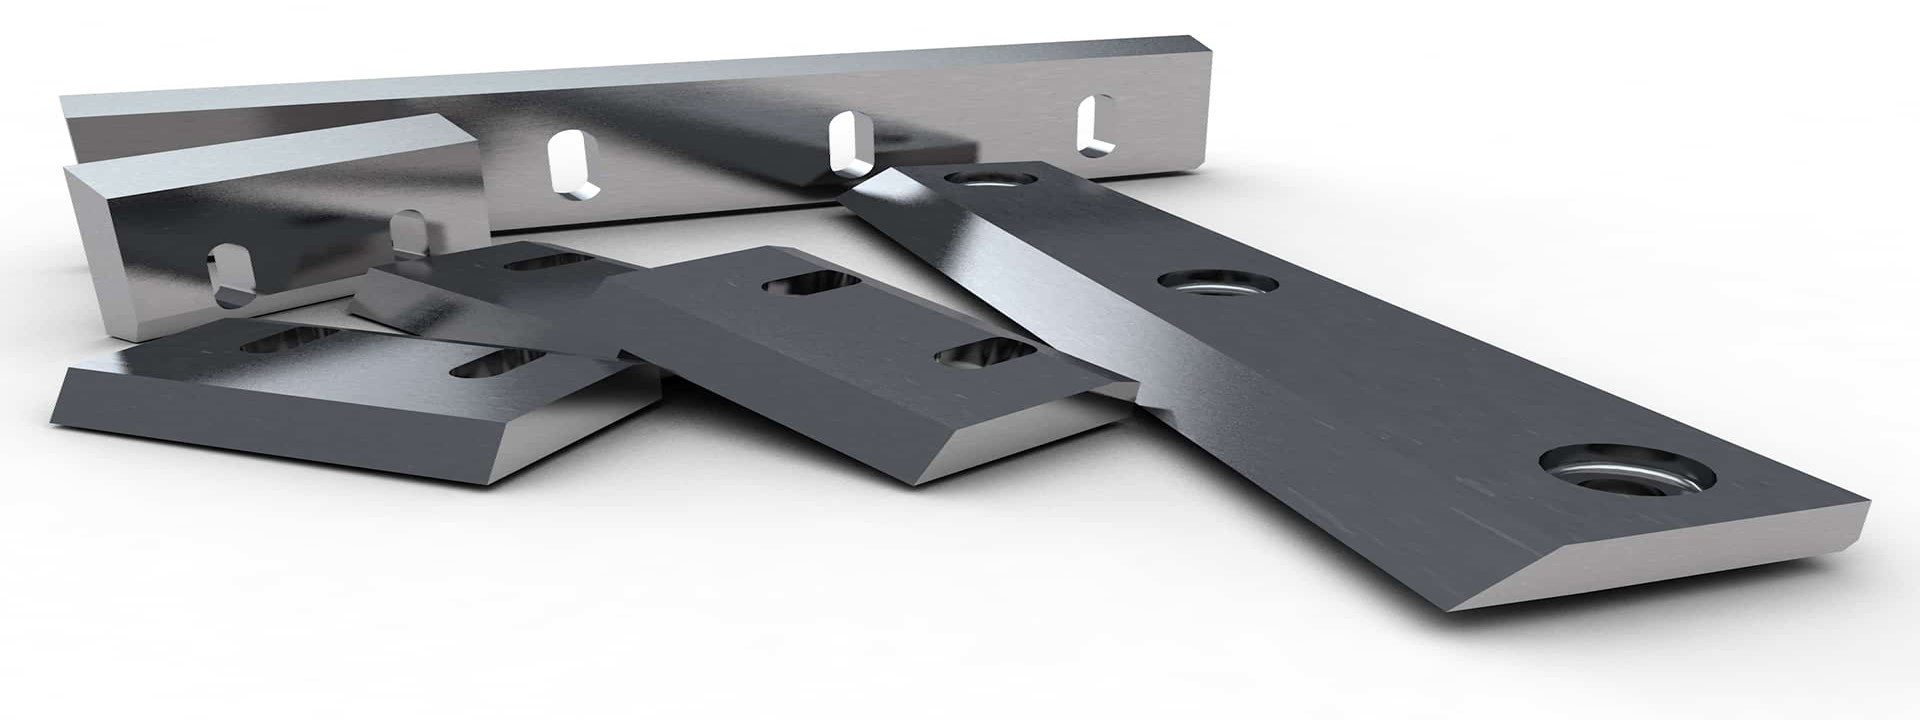 knife crusher - Ножи для дробилок